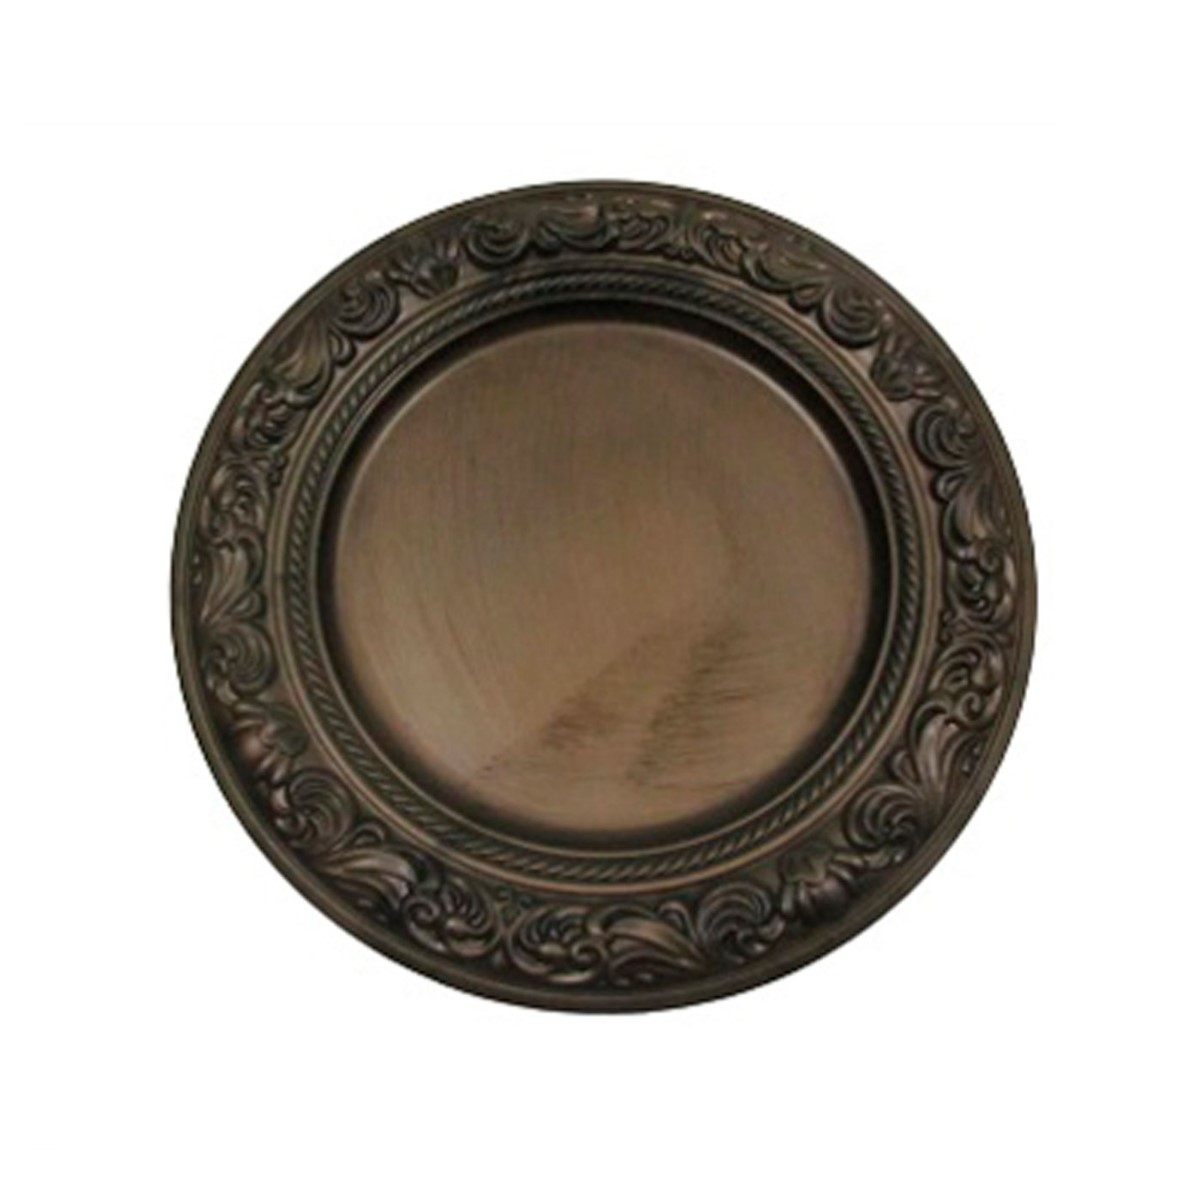 Sousplat Barroco Bronze Ref:sp20017 - Mimo